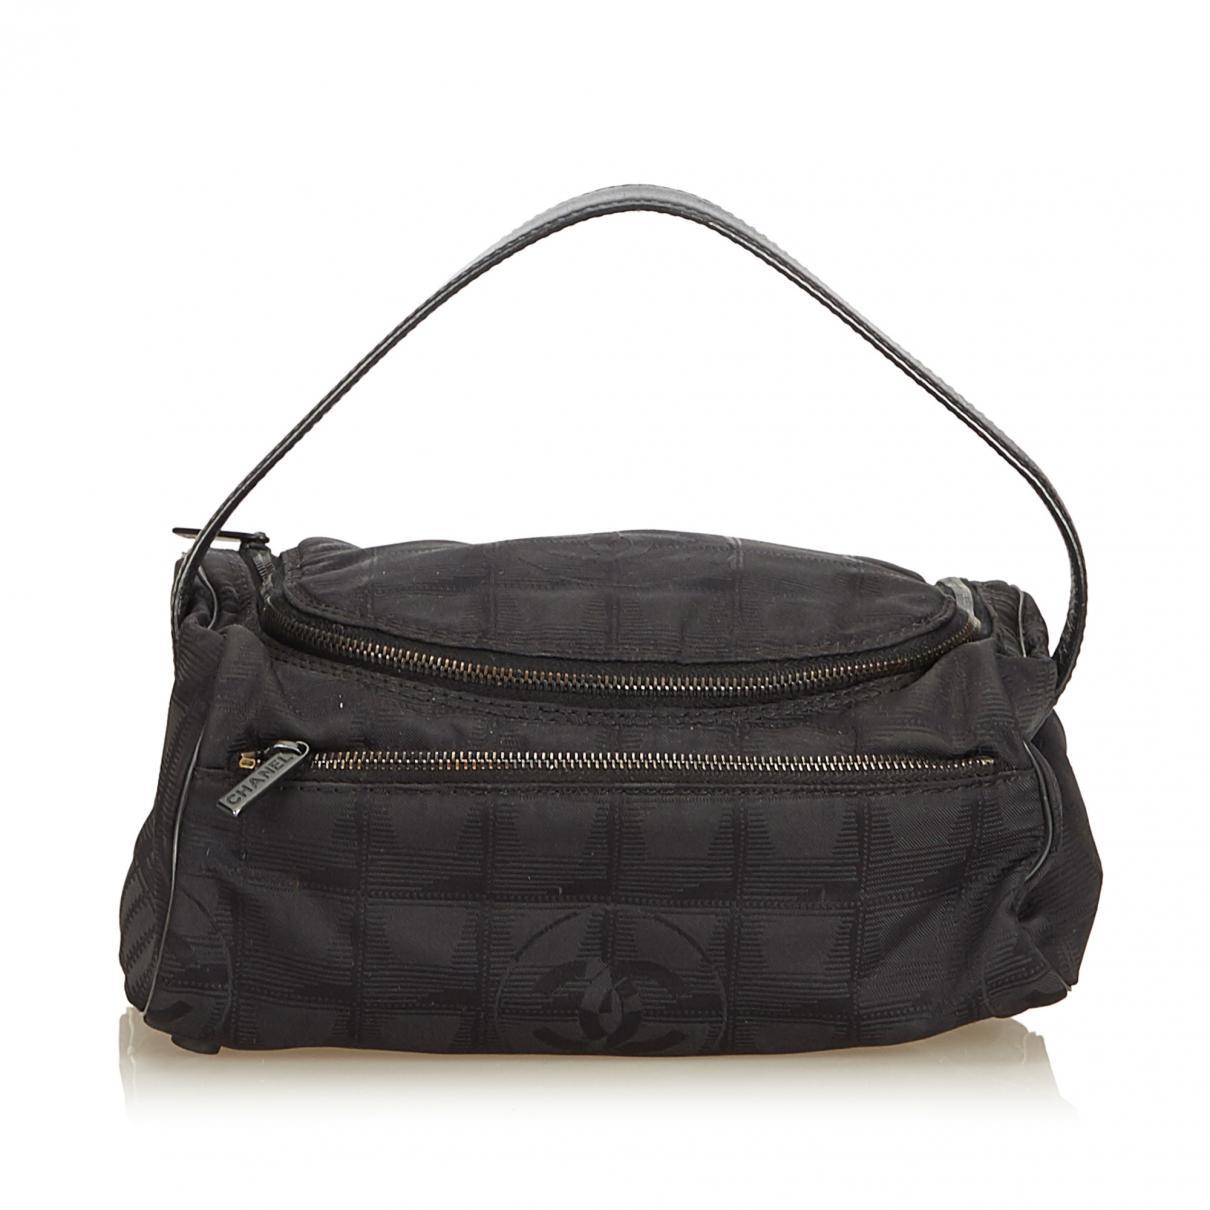 bf06c71cf Chanel Cloth Vanity Case in Black - Lyst